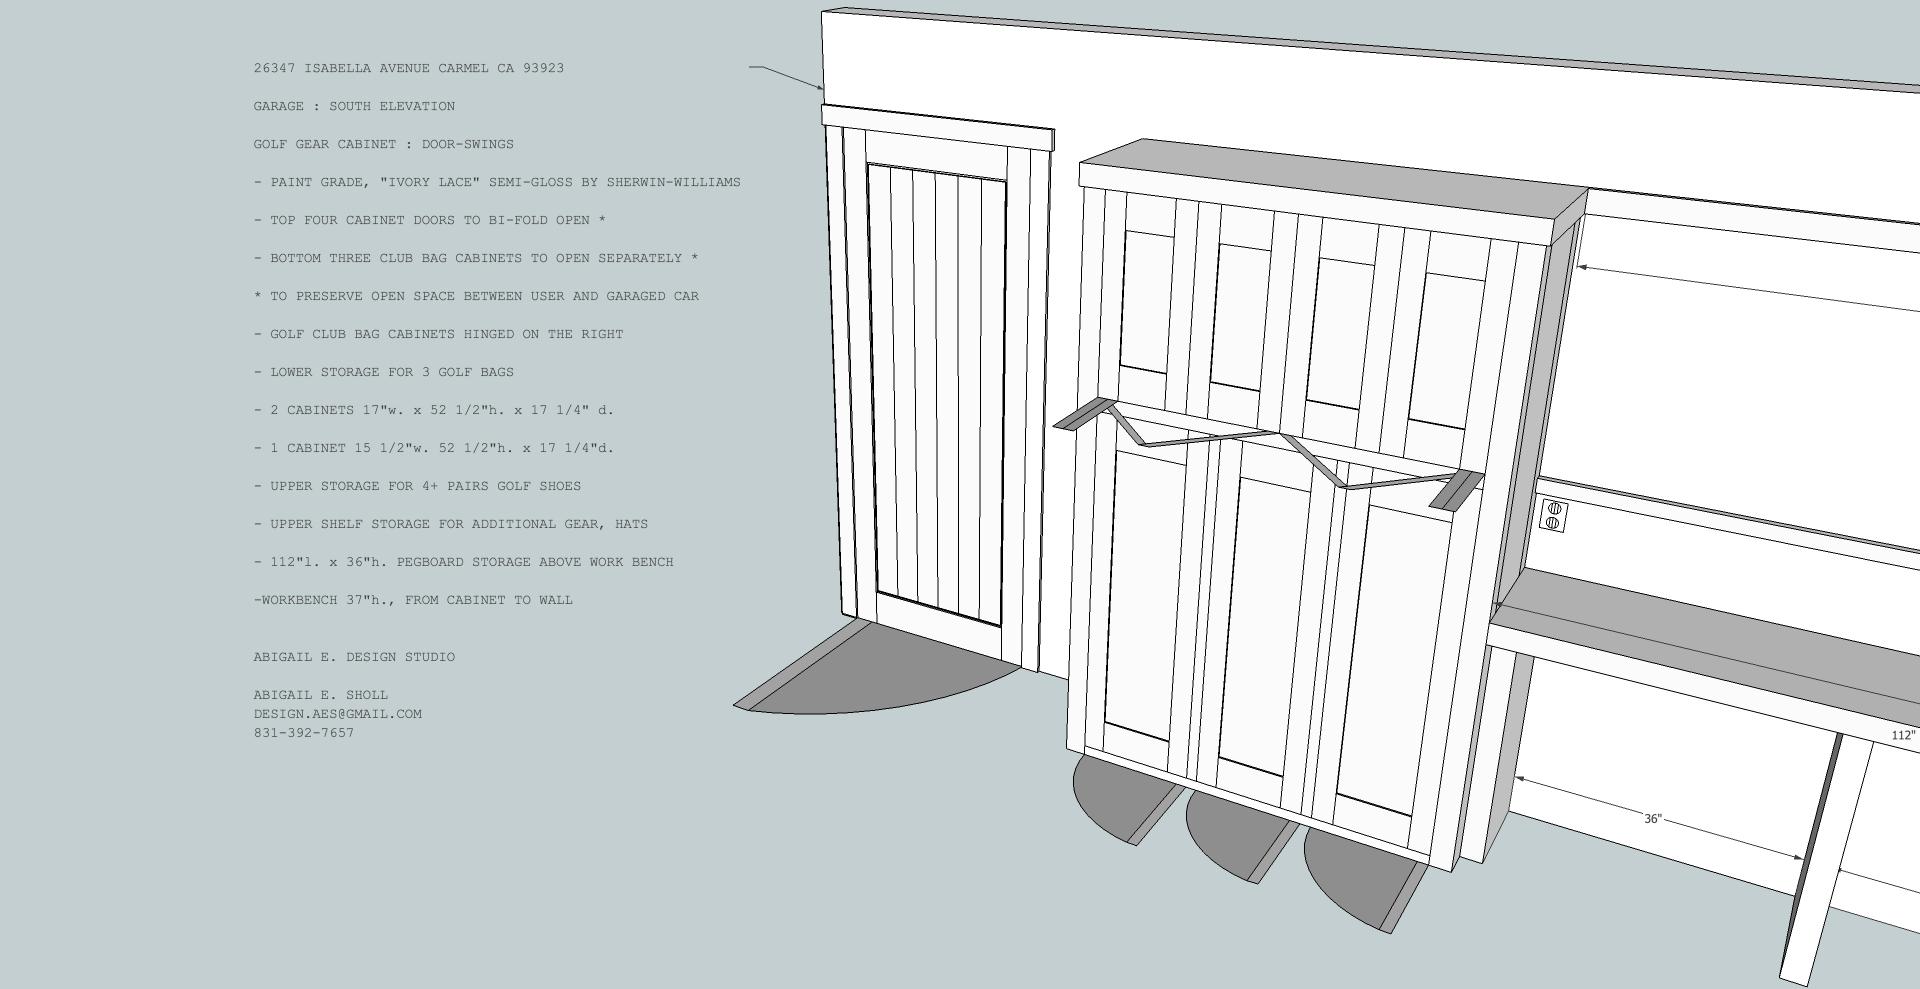 GARAGE_SOUTH_ISABELLA_DOORSWINGS.jpg